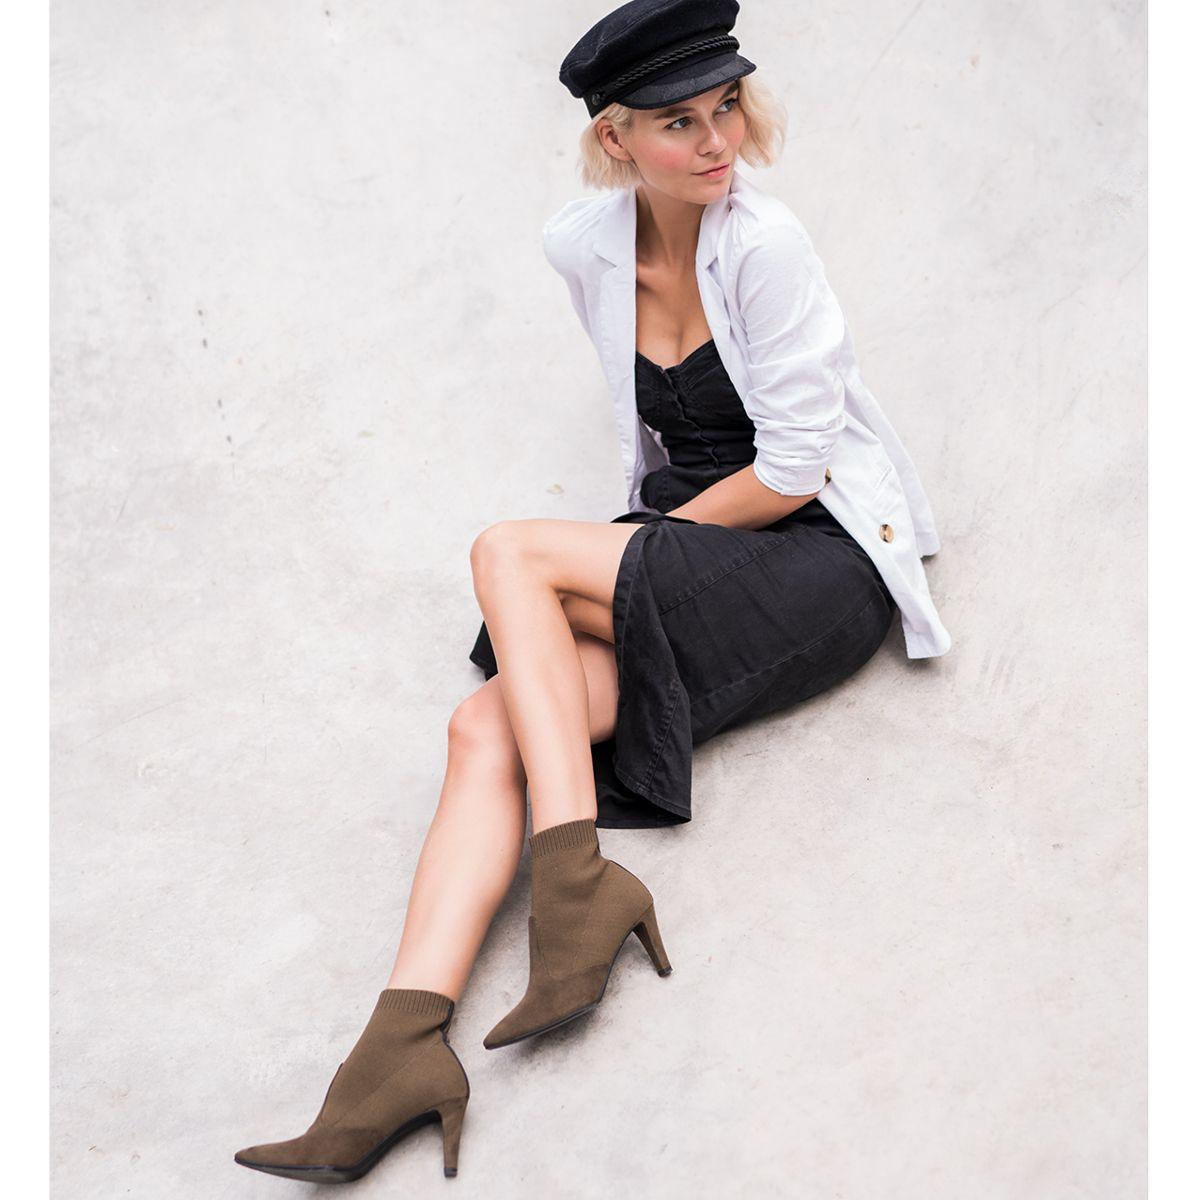 Elegant Feminin Und Cool So Prasentiert Louiblog Unsere Sock Boots Aus Der Metropolitan Kollektion Tamaris Tamarismetr Mit Bildern Schuhe Damen Modestil Damenschuhe